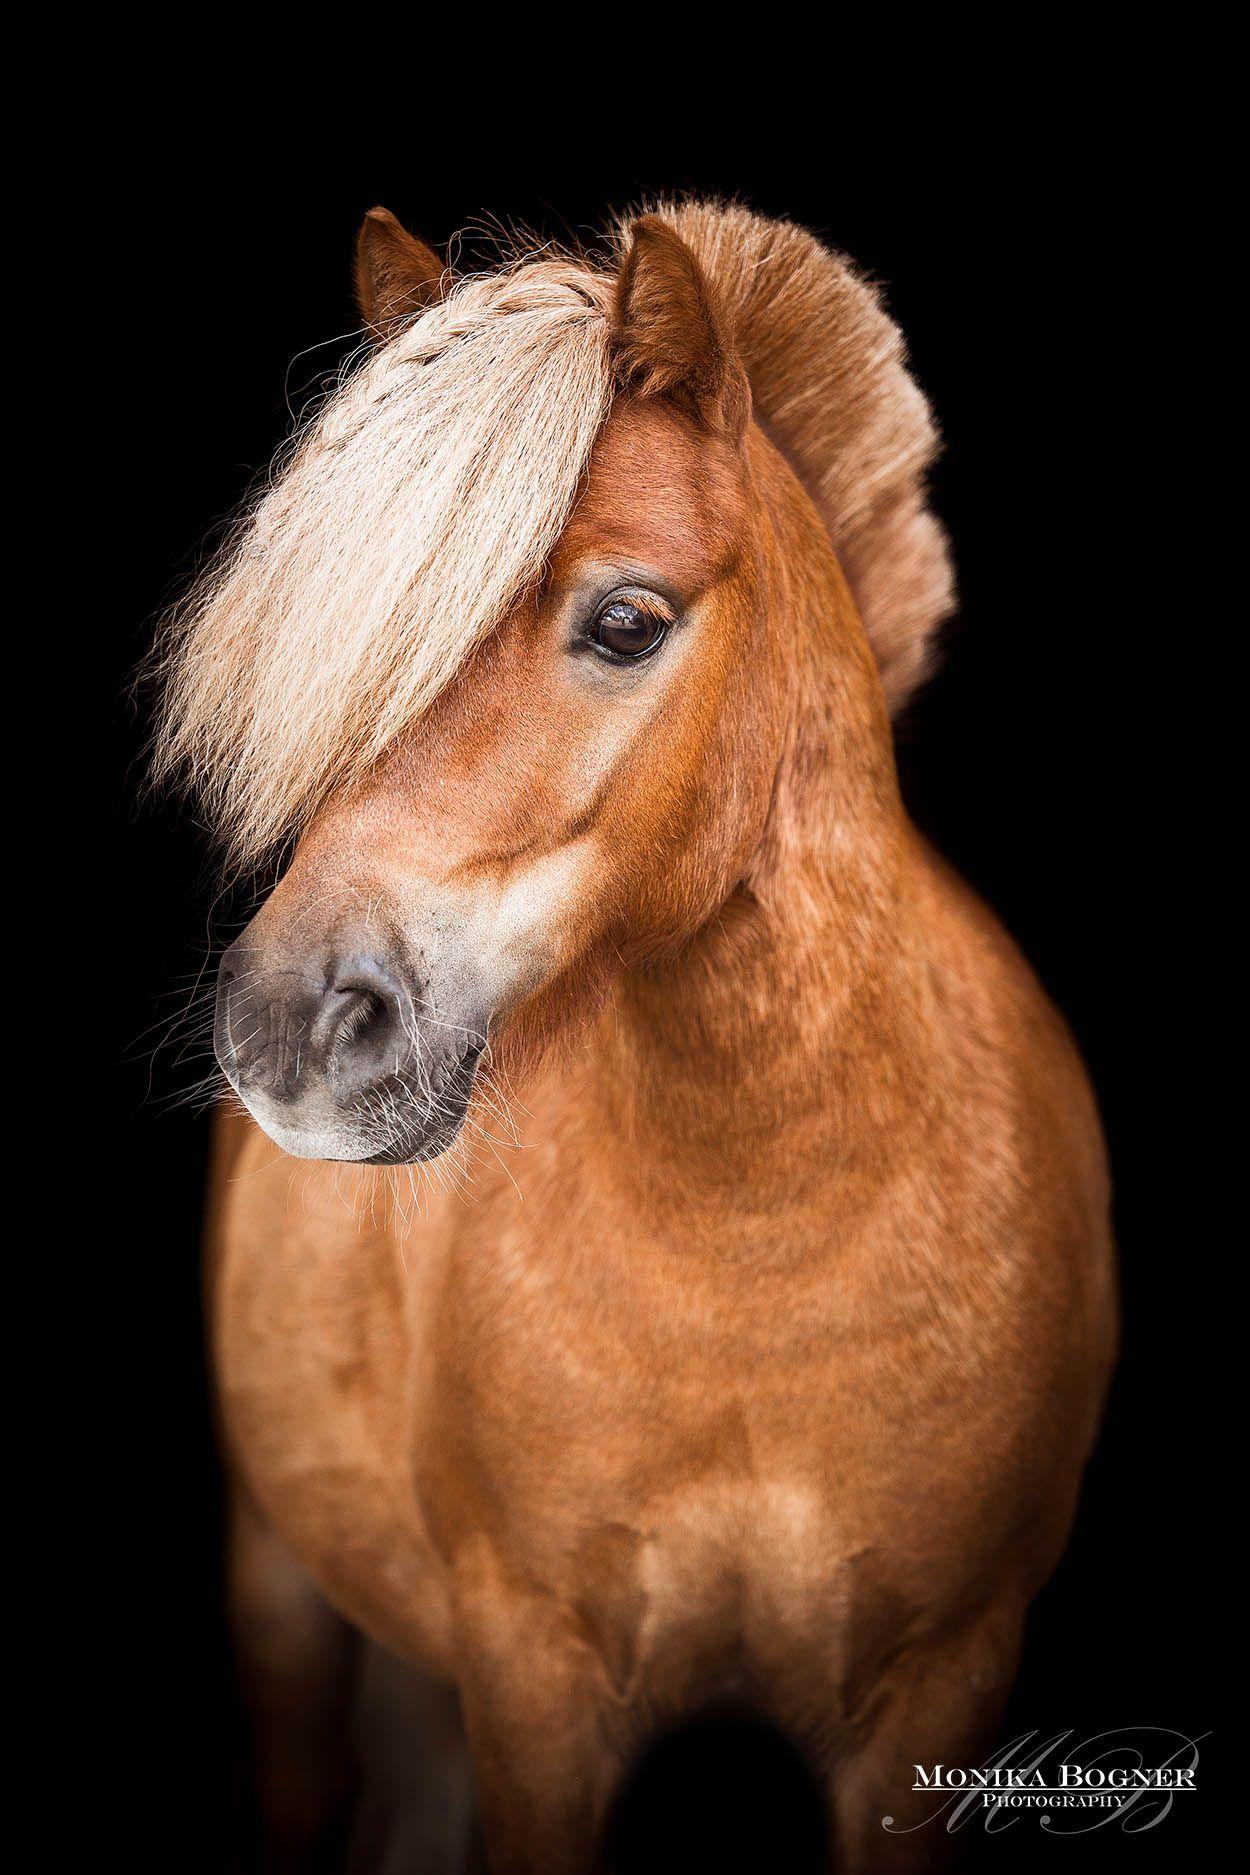 Pony Klassische Pferdeportraits Vor Schwarzen Hintergrund Monika Bogner Photography Pferde Fotografie Pferde Pferdefotografie